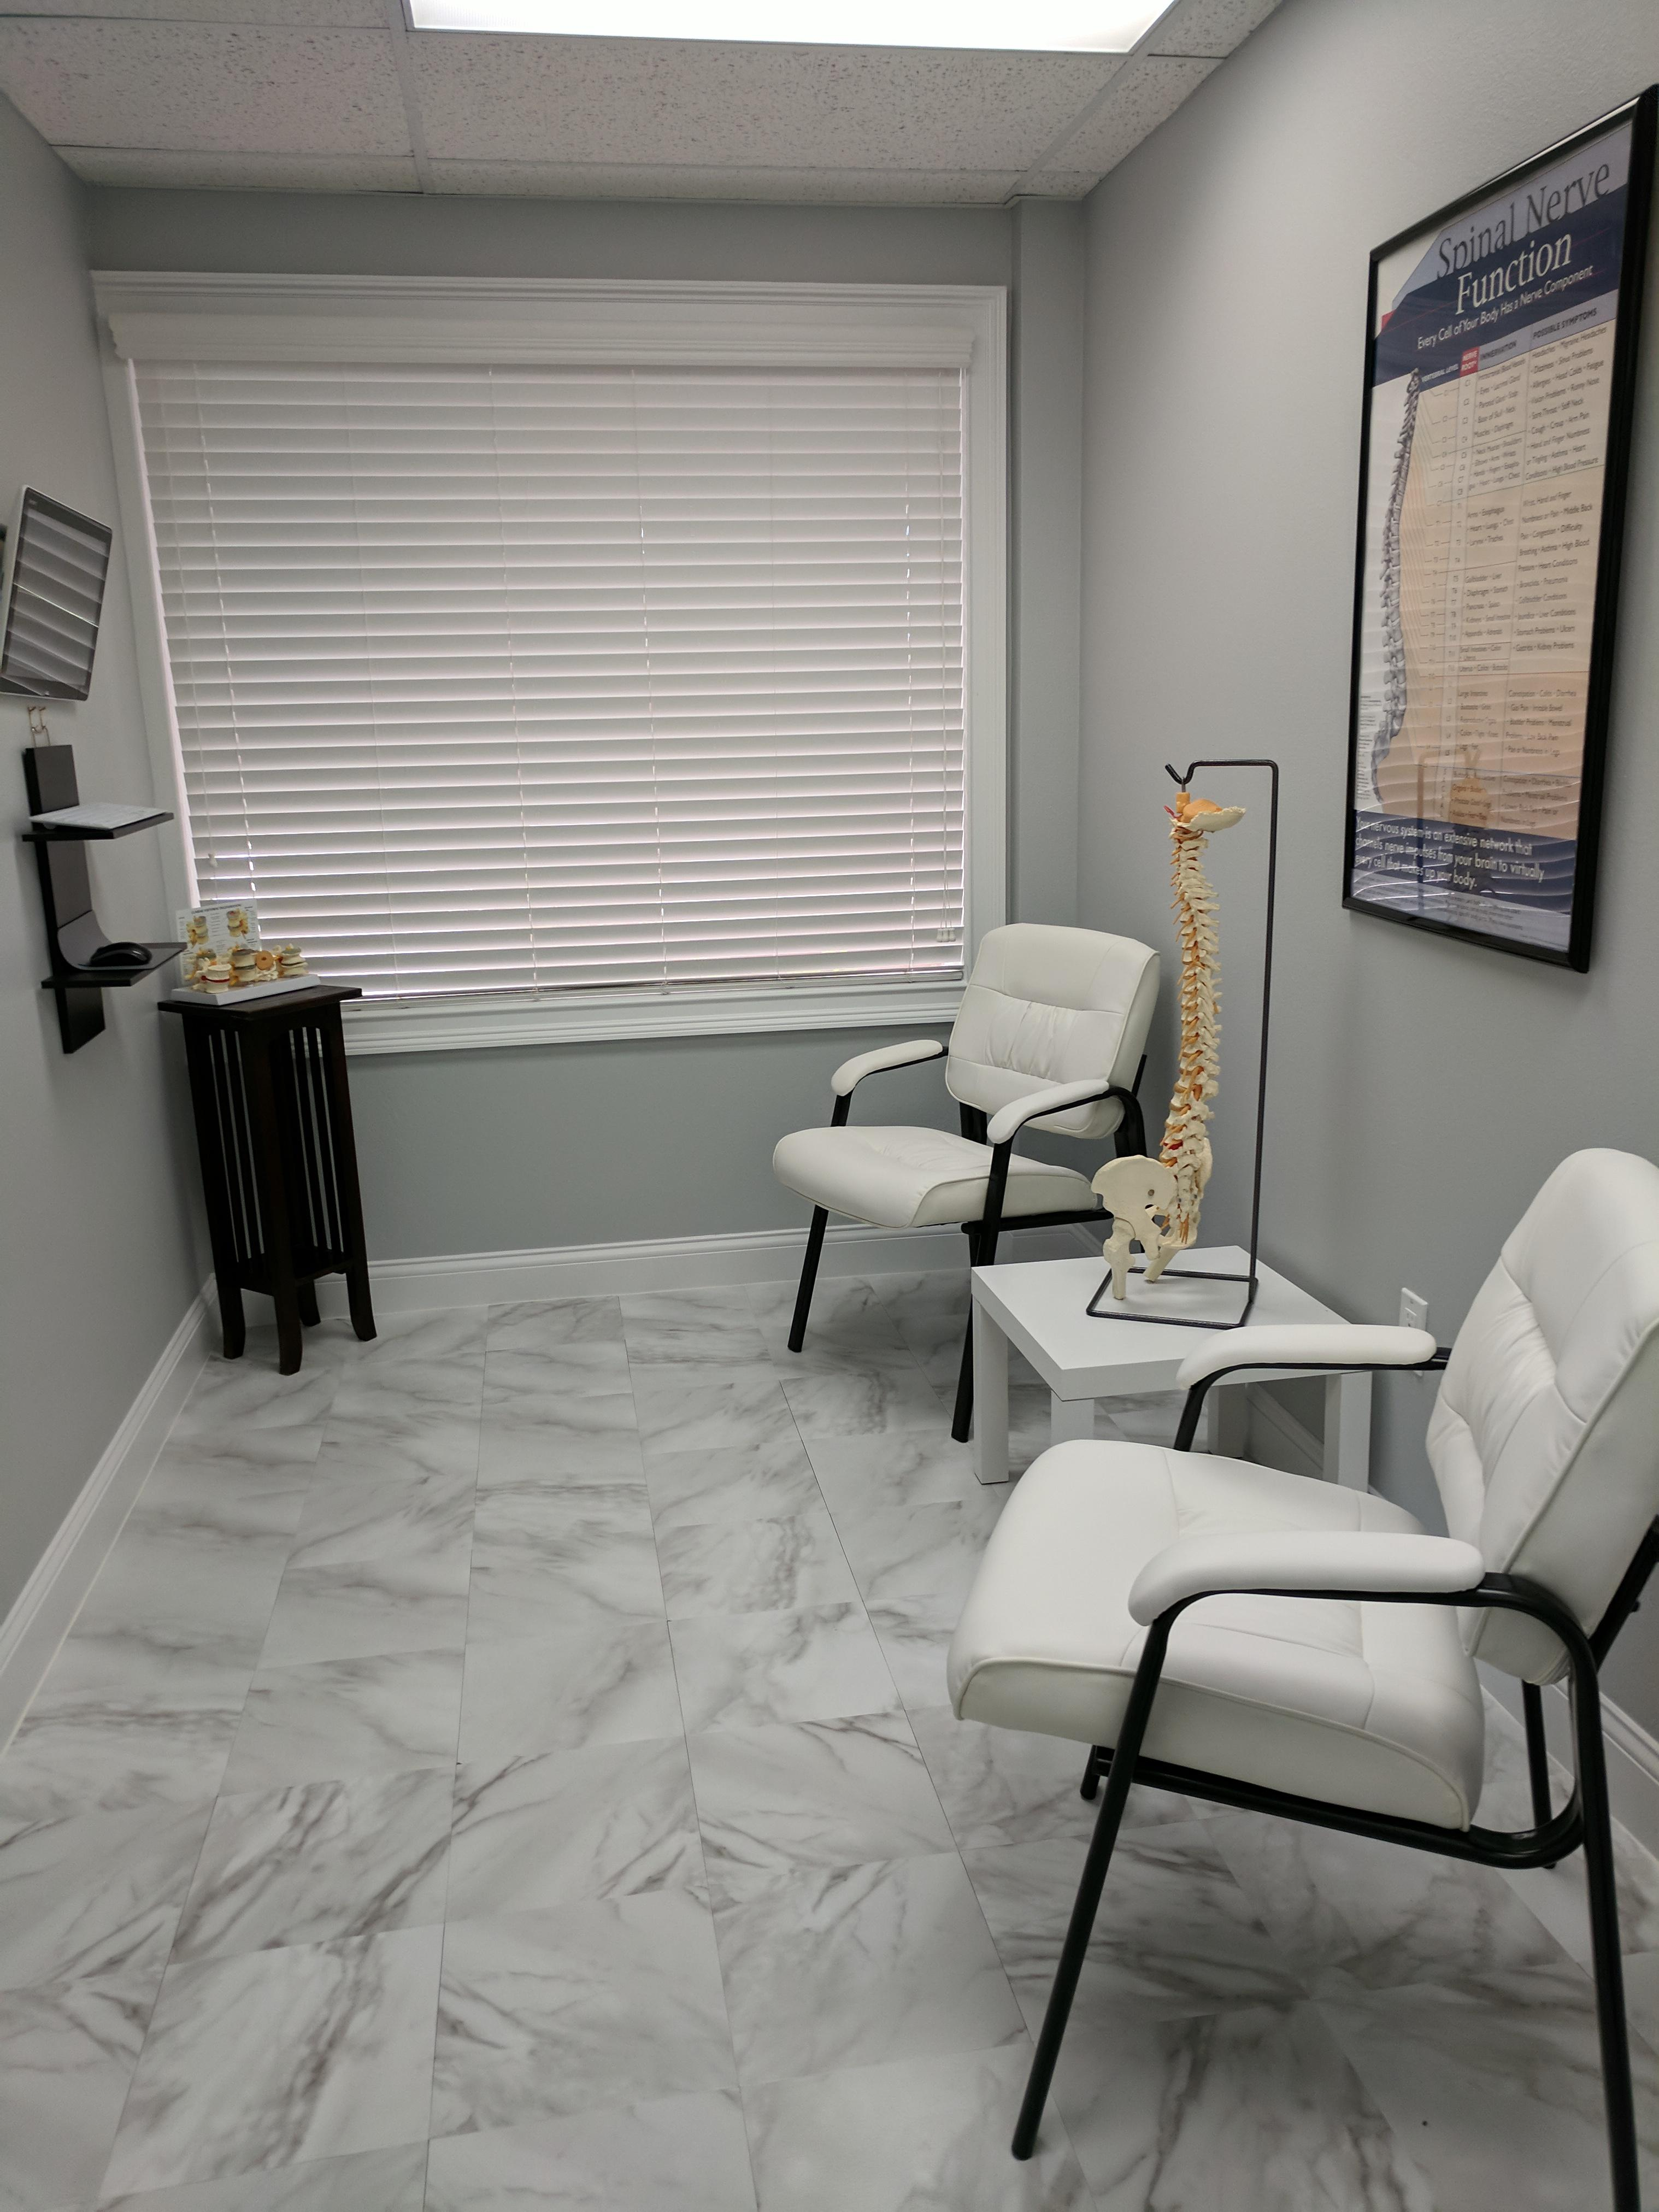 United Joint & Spine Center image 7